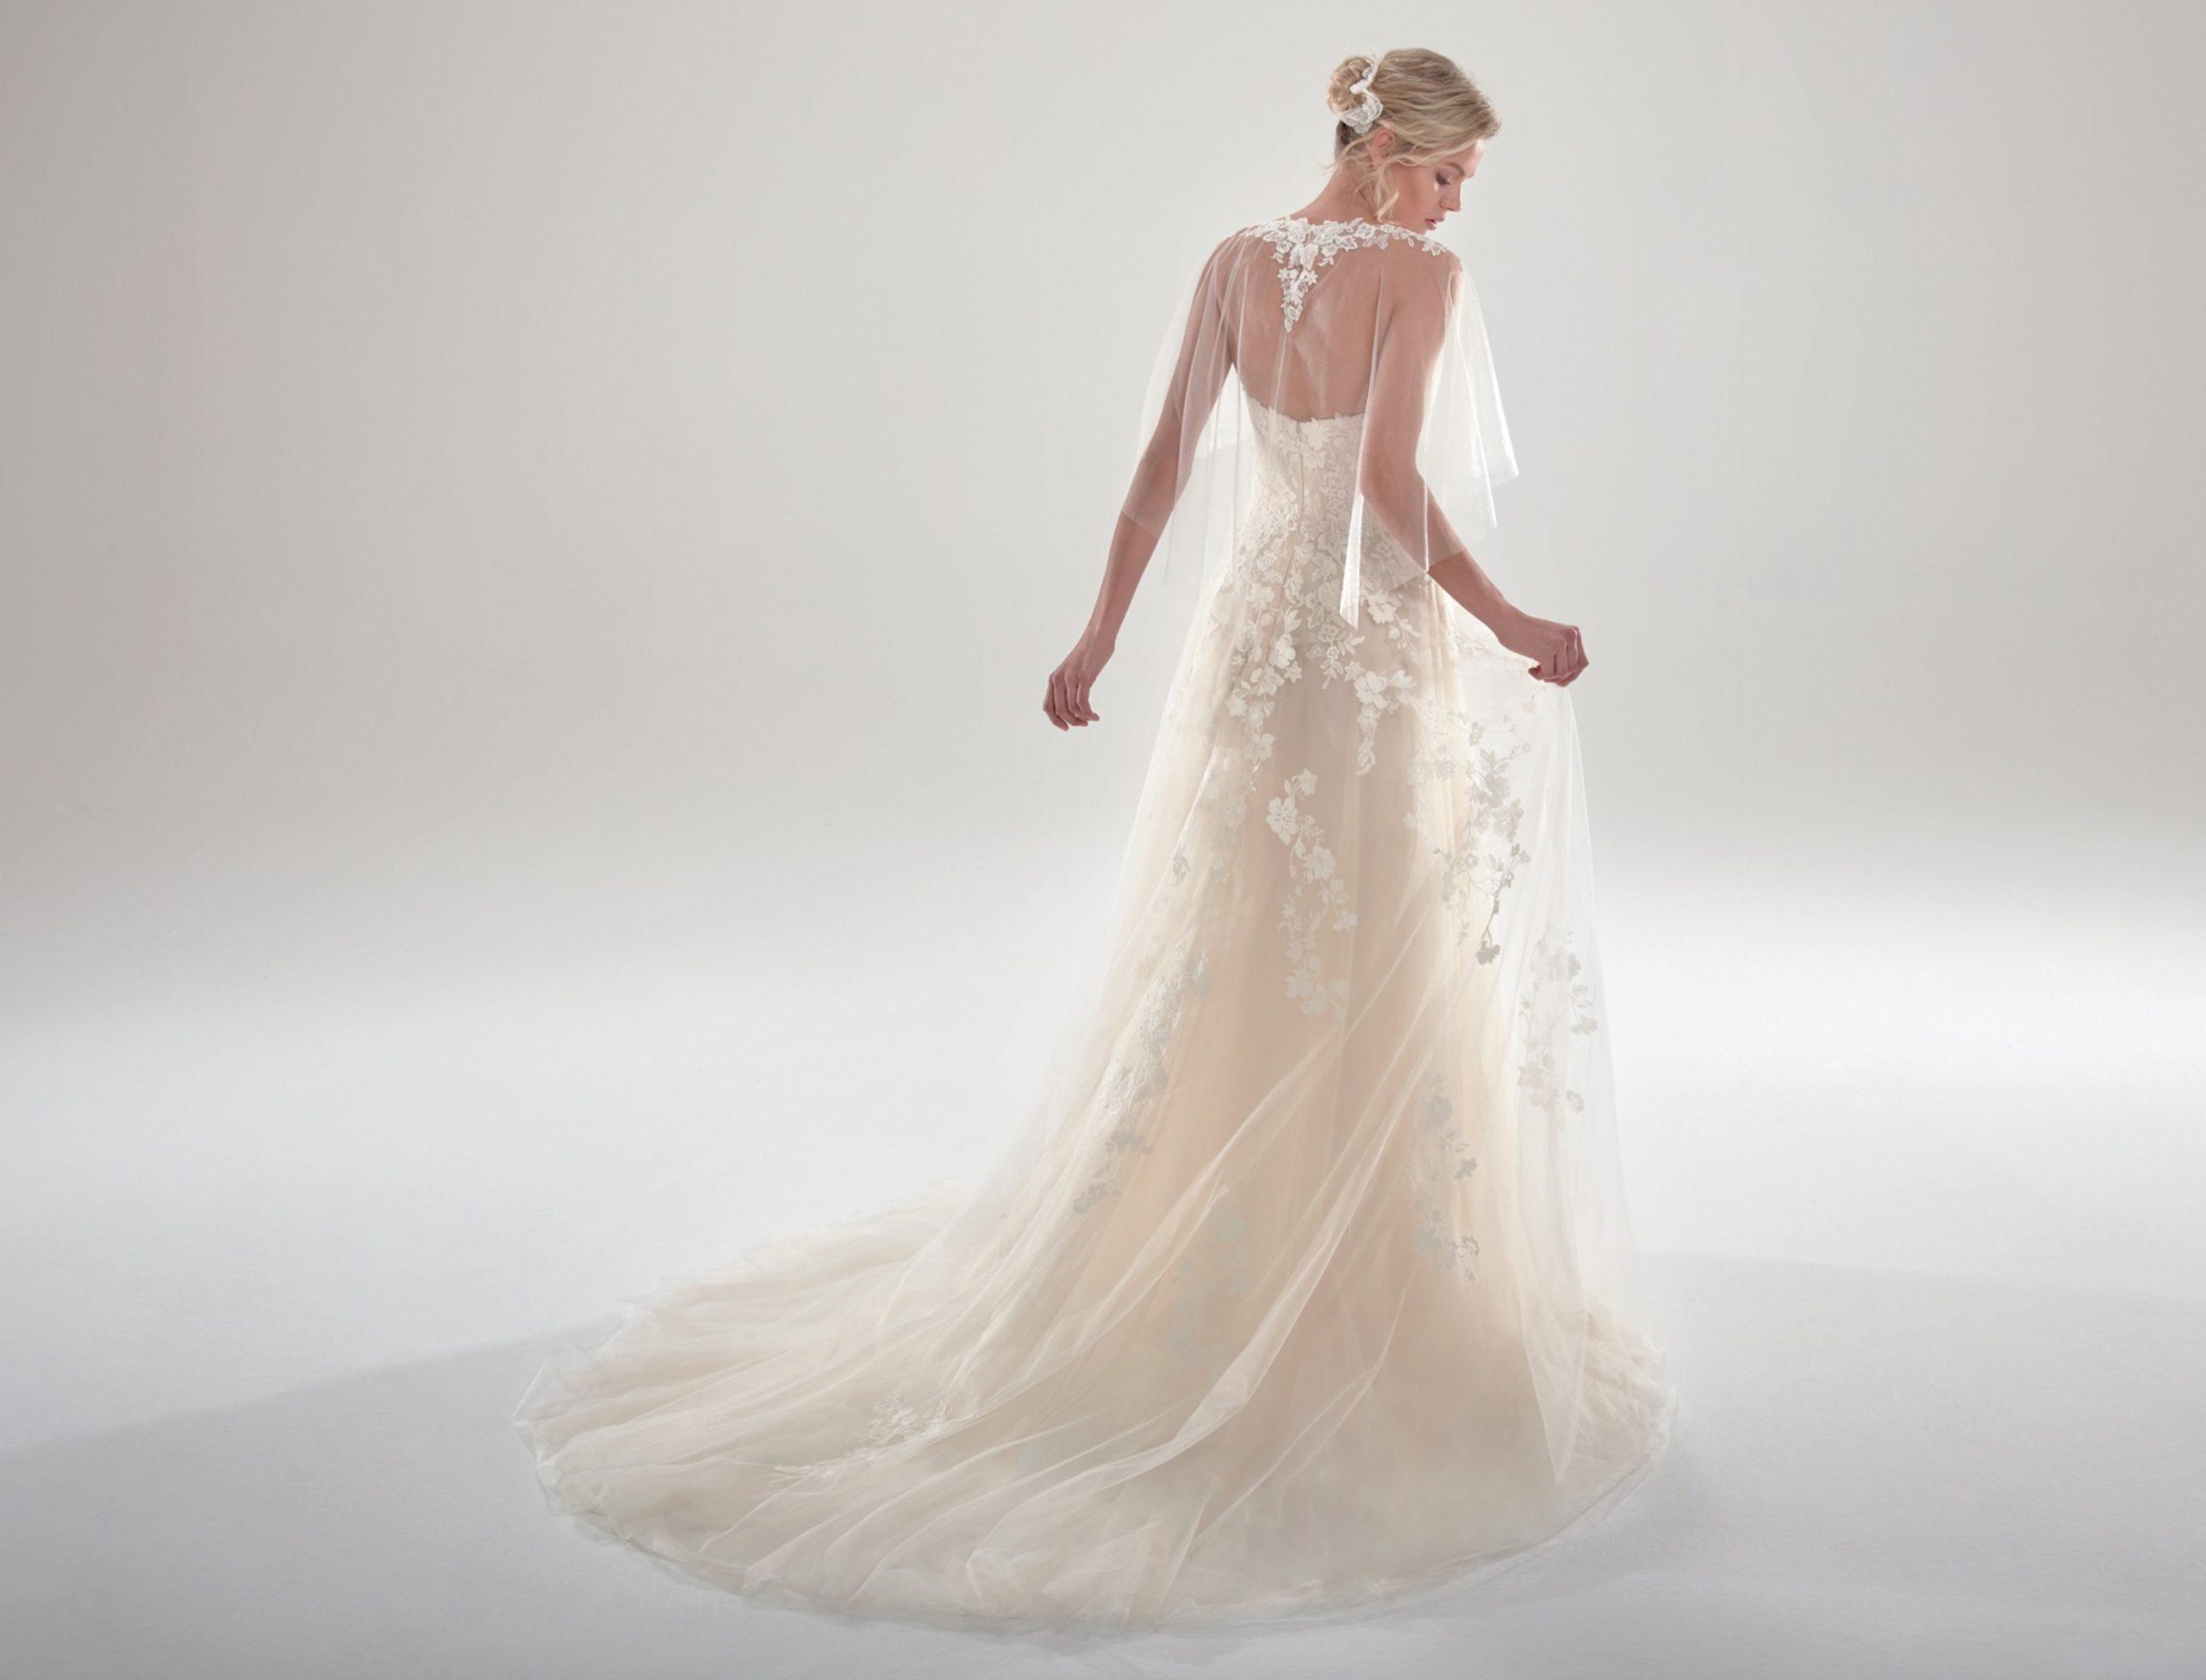 Brautkleid A-Linie fließend